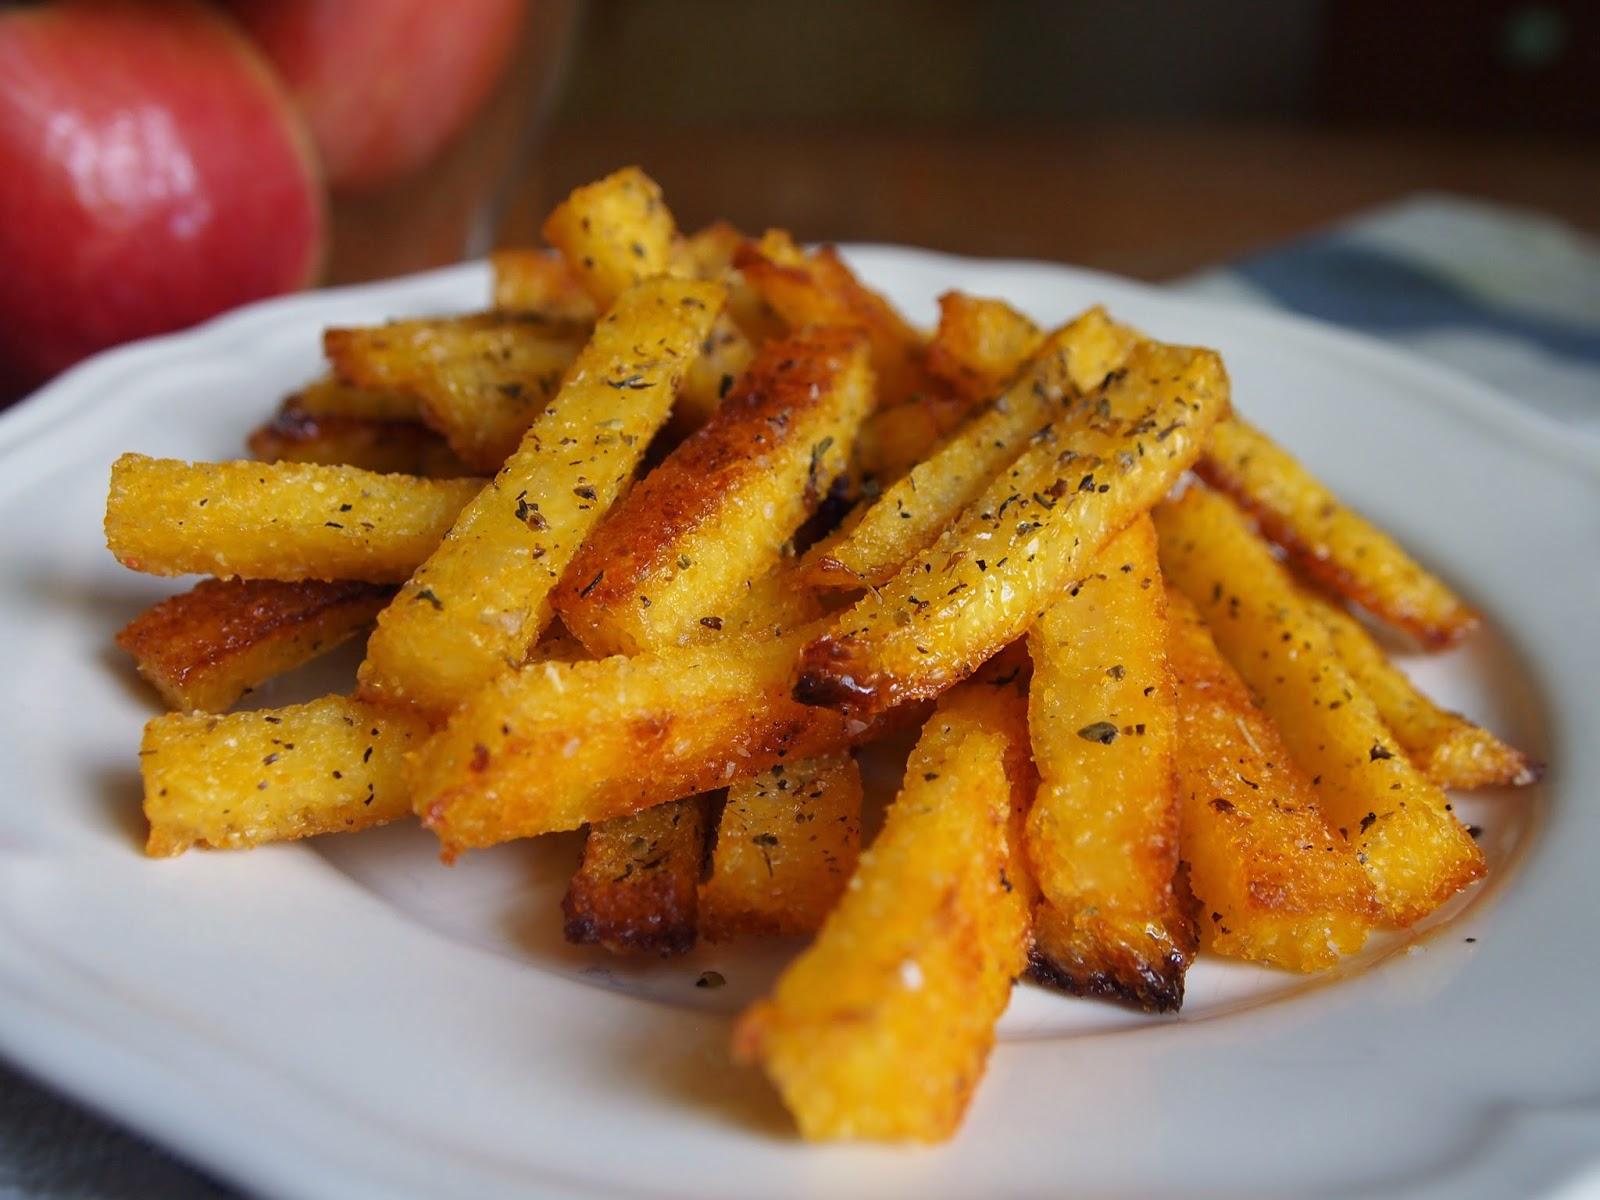 P B and J Eats: Baked Polenta Fries